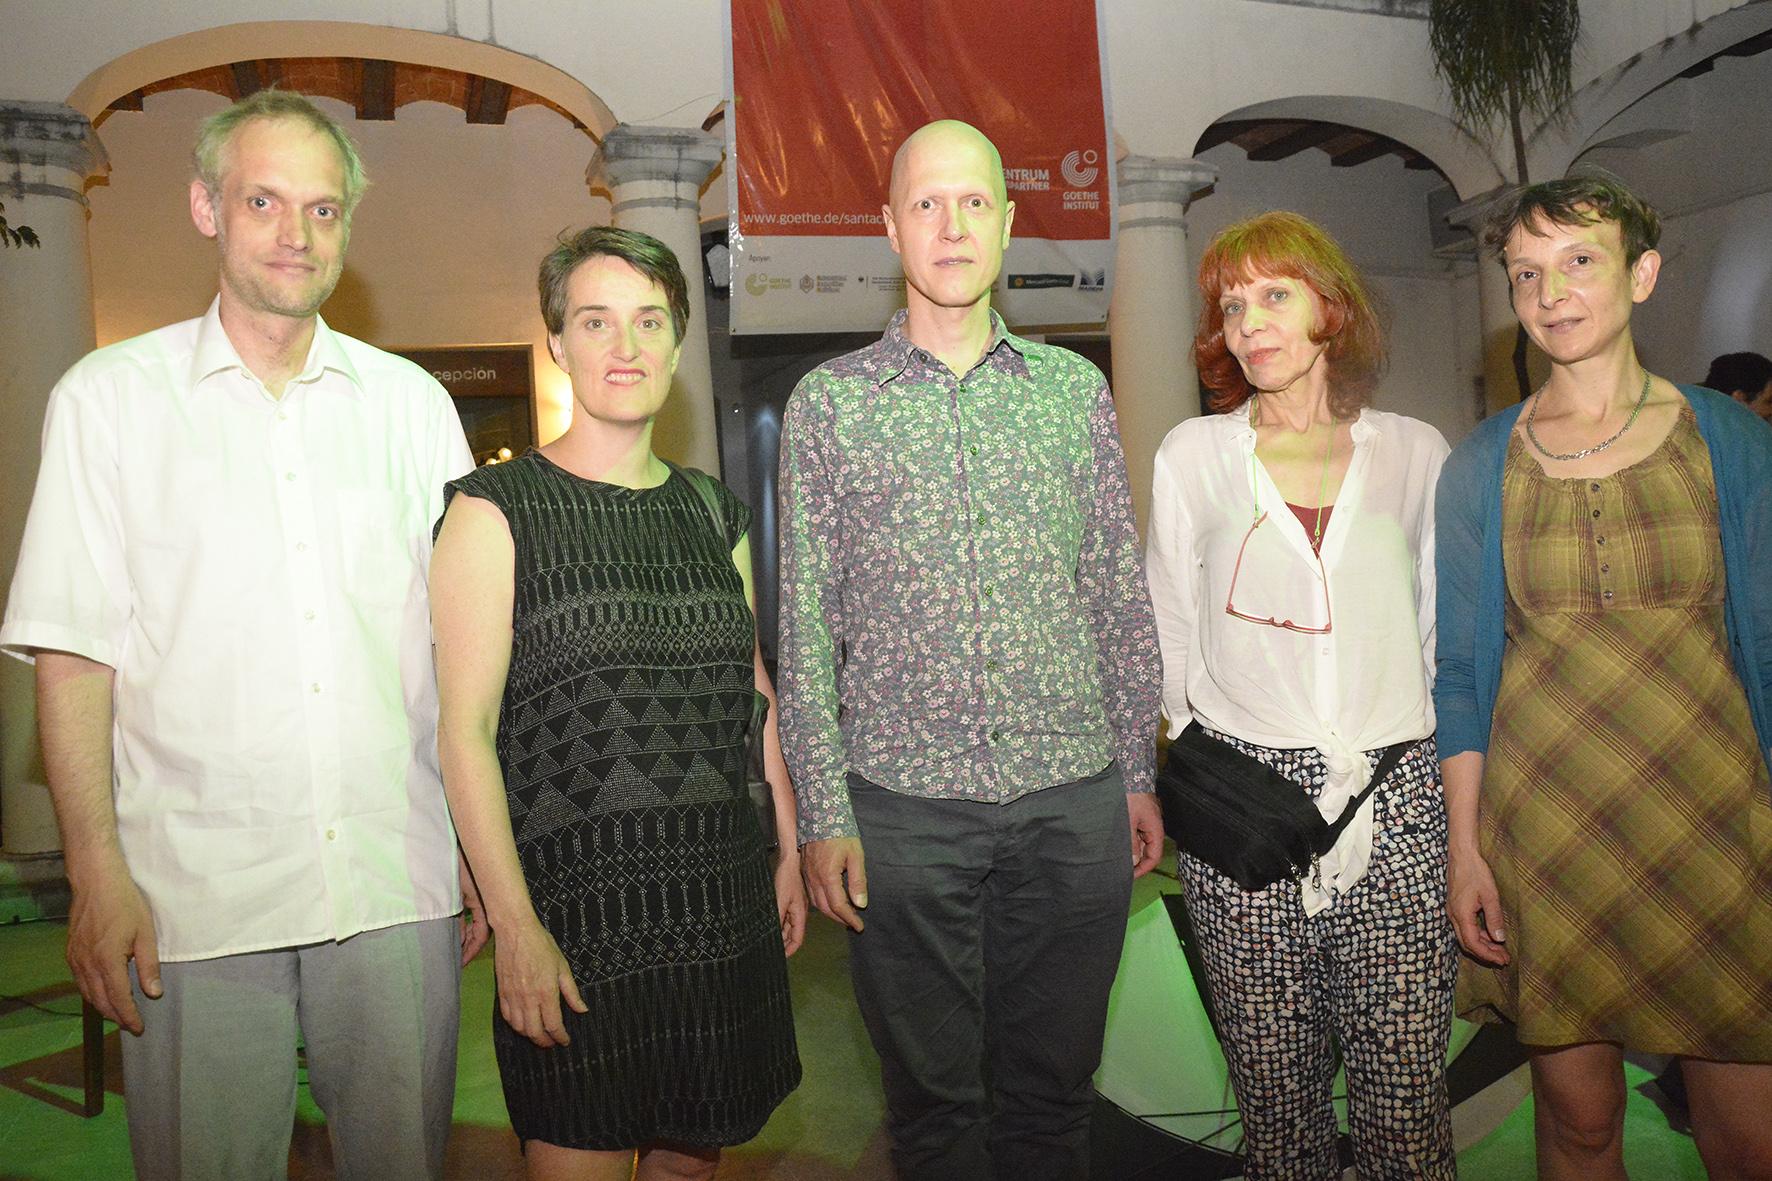 Ensamble Maulwerker. Henrik Kairies, Steffi Weismann, Christian Kesten, Katarina Rasinski y Ariane Jessulat.